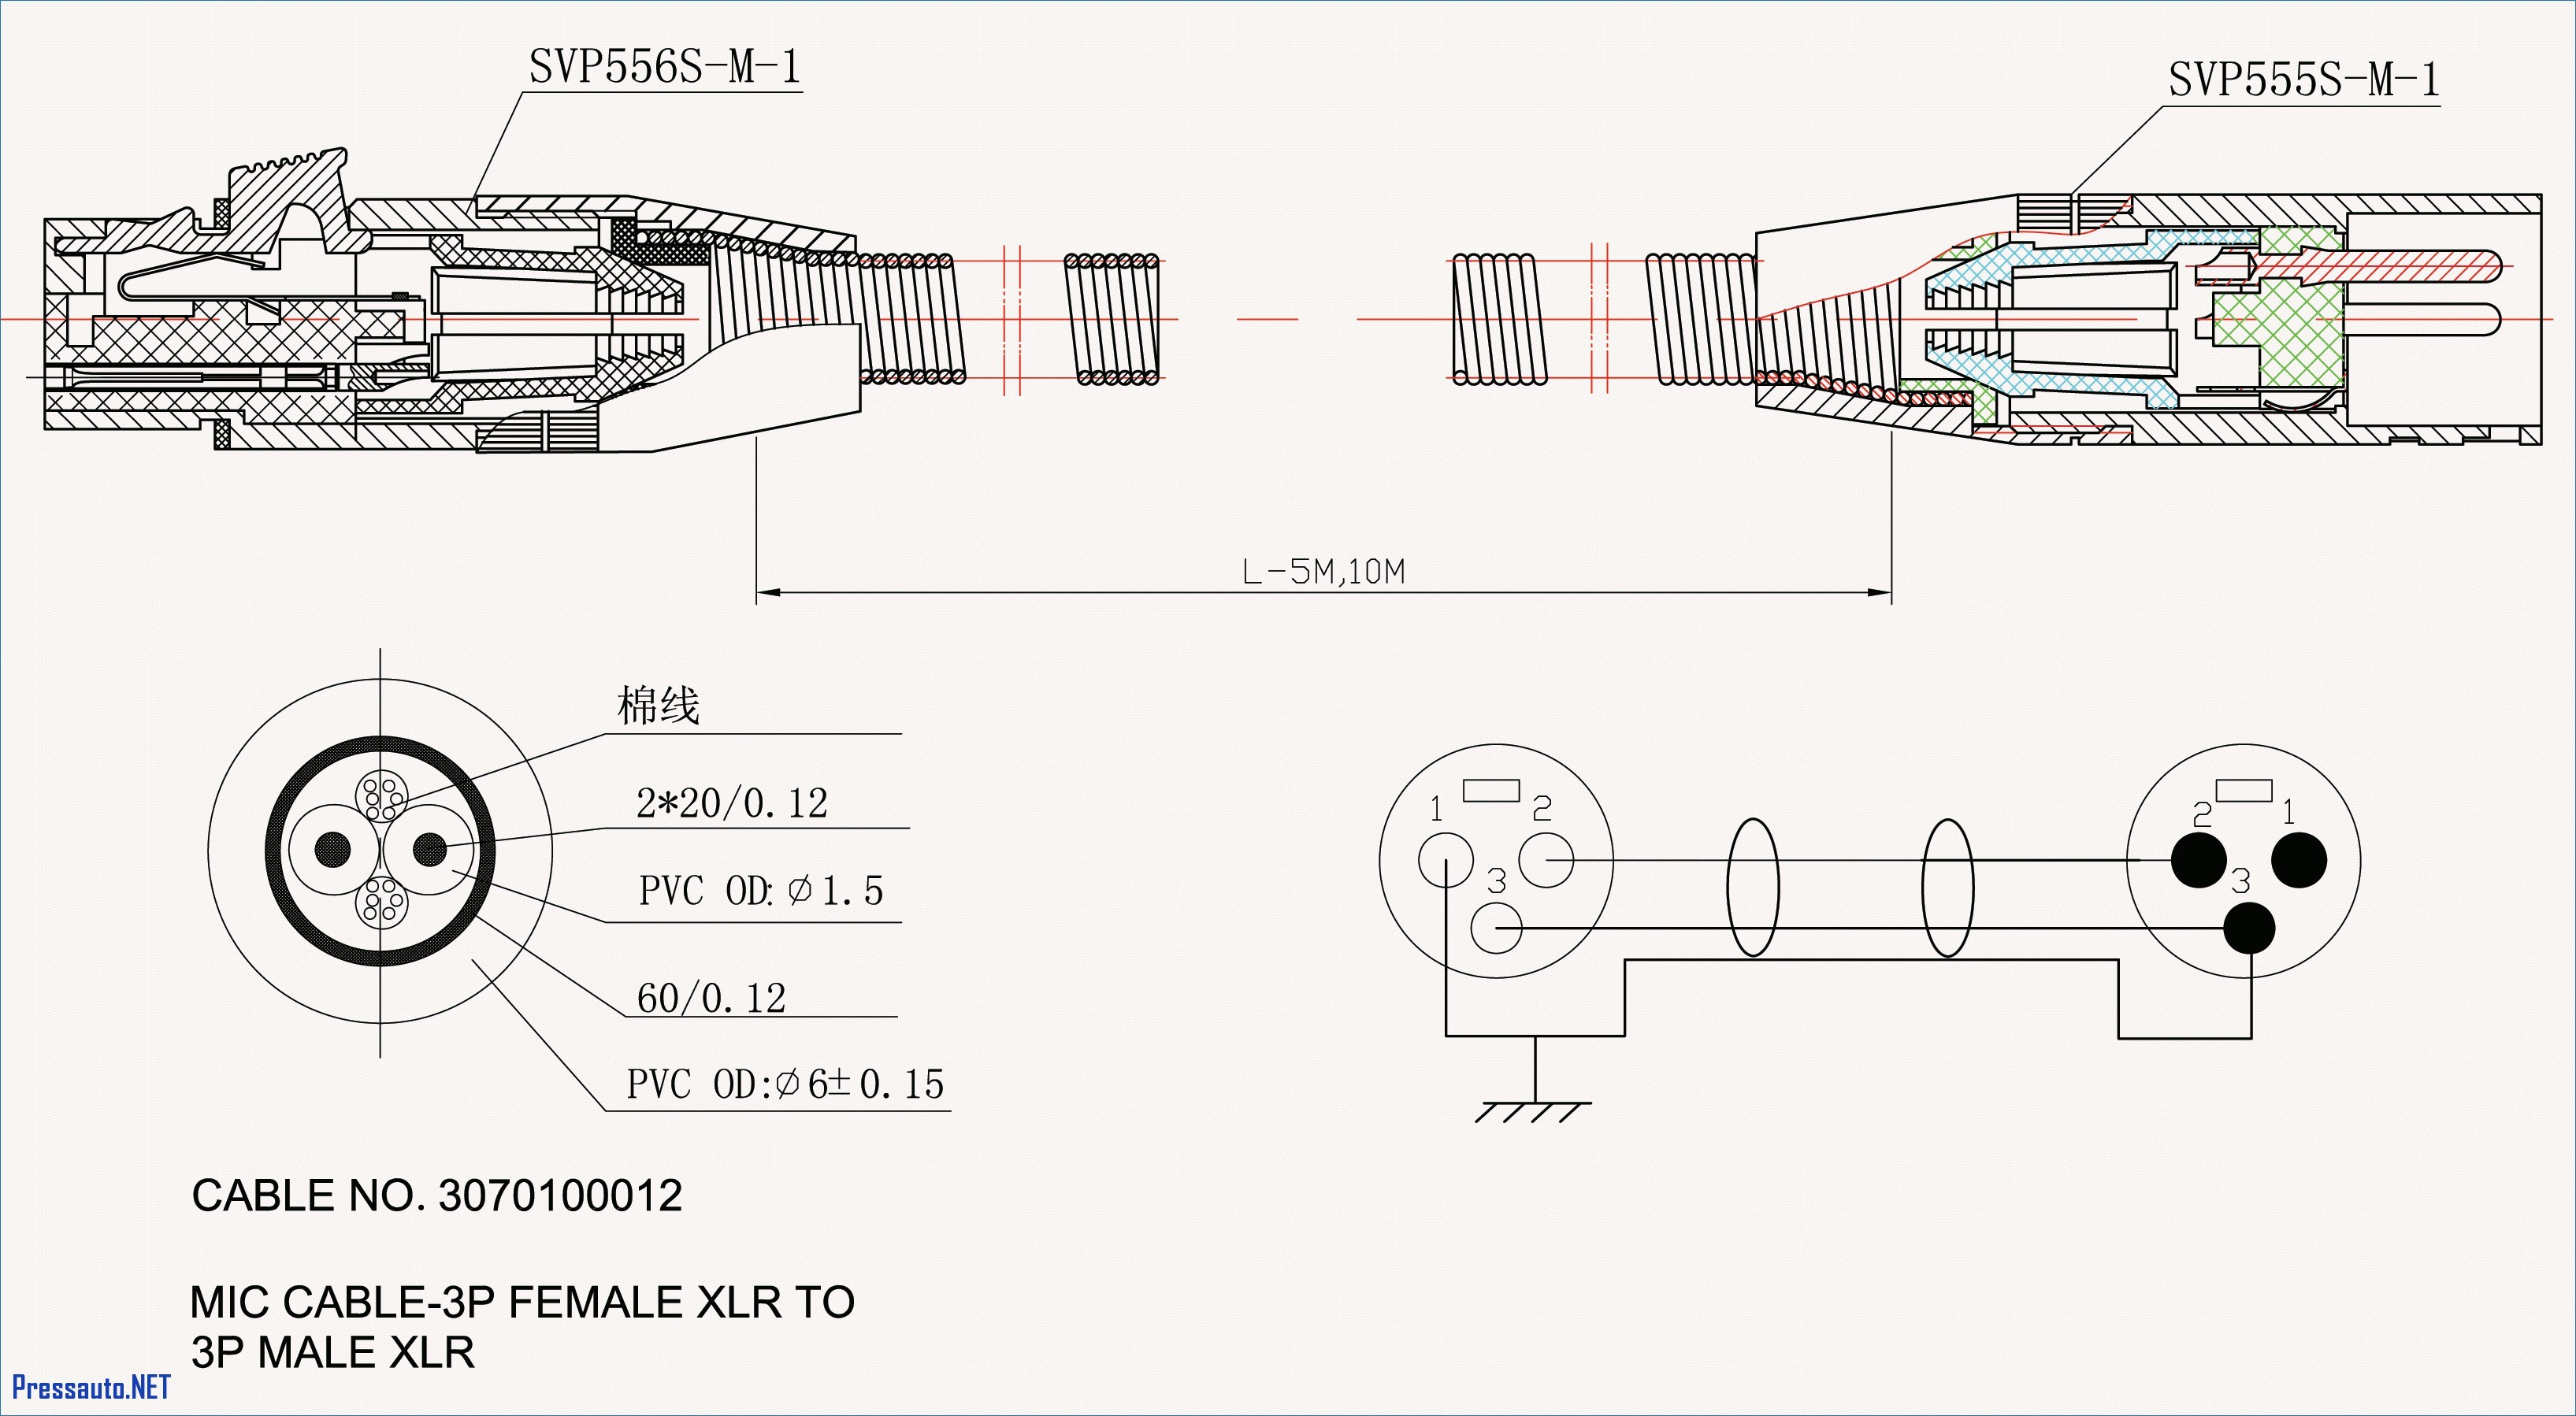 Cat5 Connector Wiring Diagram Wiring Diagram for Cat5 Cable ... on network wiring diagram, cat5 cable diagram, cat5 wiring scheme, cat5e pinout diagram, cat5 connector wiring pattern, crossover cable wiring diagram, ethernet pinout diagram, cat5 wire order, cat 6 wiring diagram, cat5 connector dimensions, cat 5 diagram, cat5e wiring diagram,